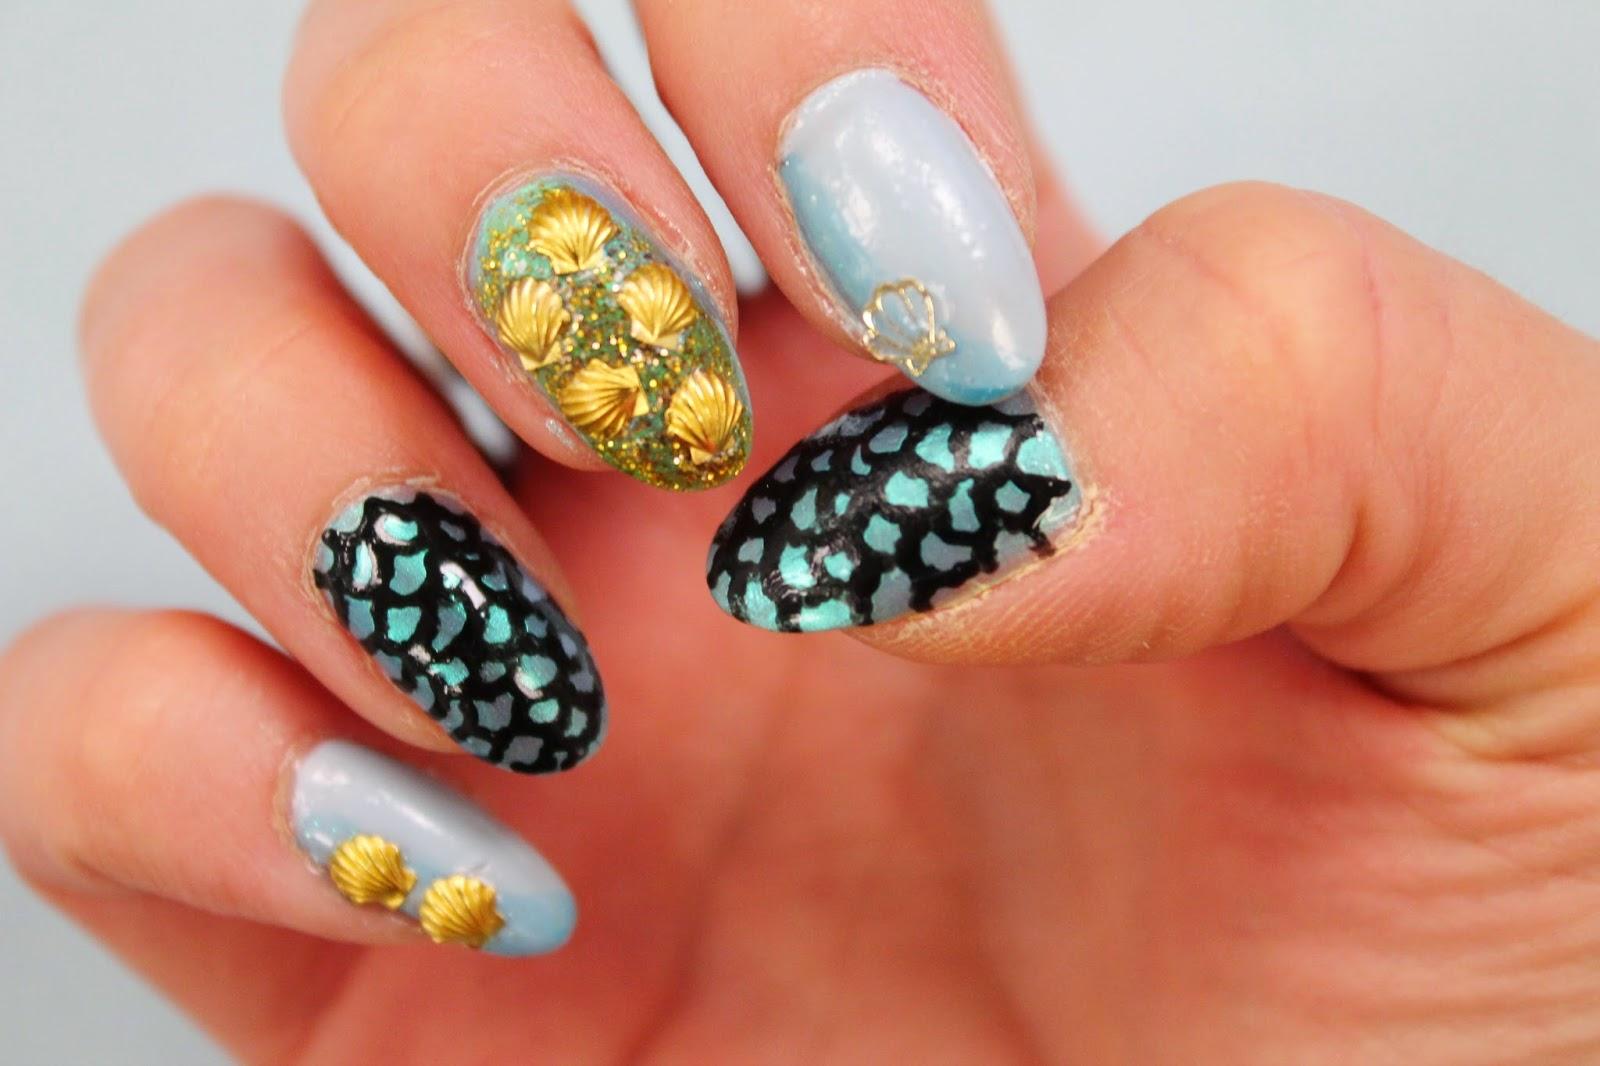 Mermaid Nails - Jersey Girl, Texan Heart